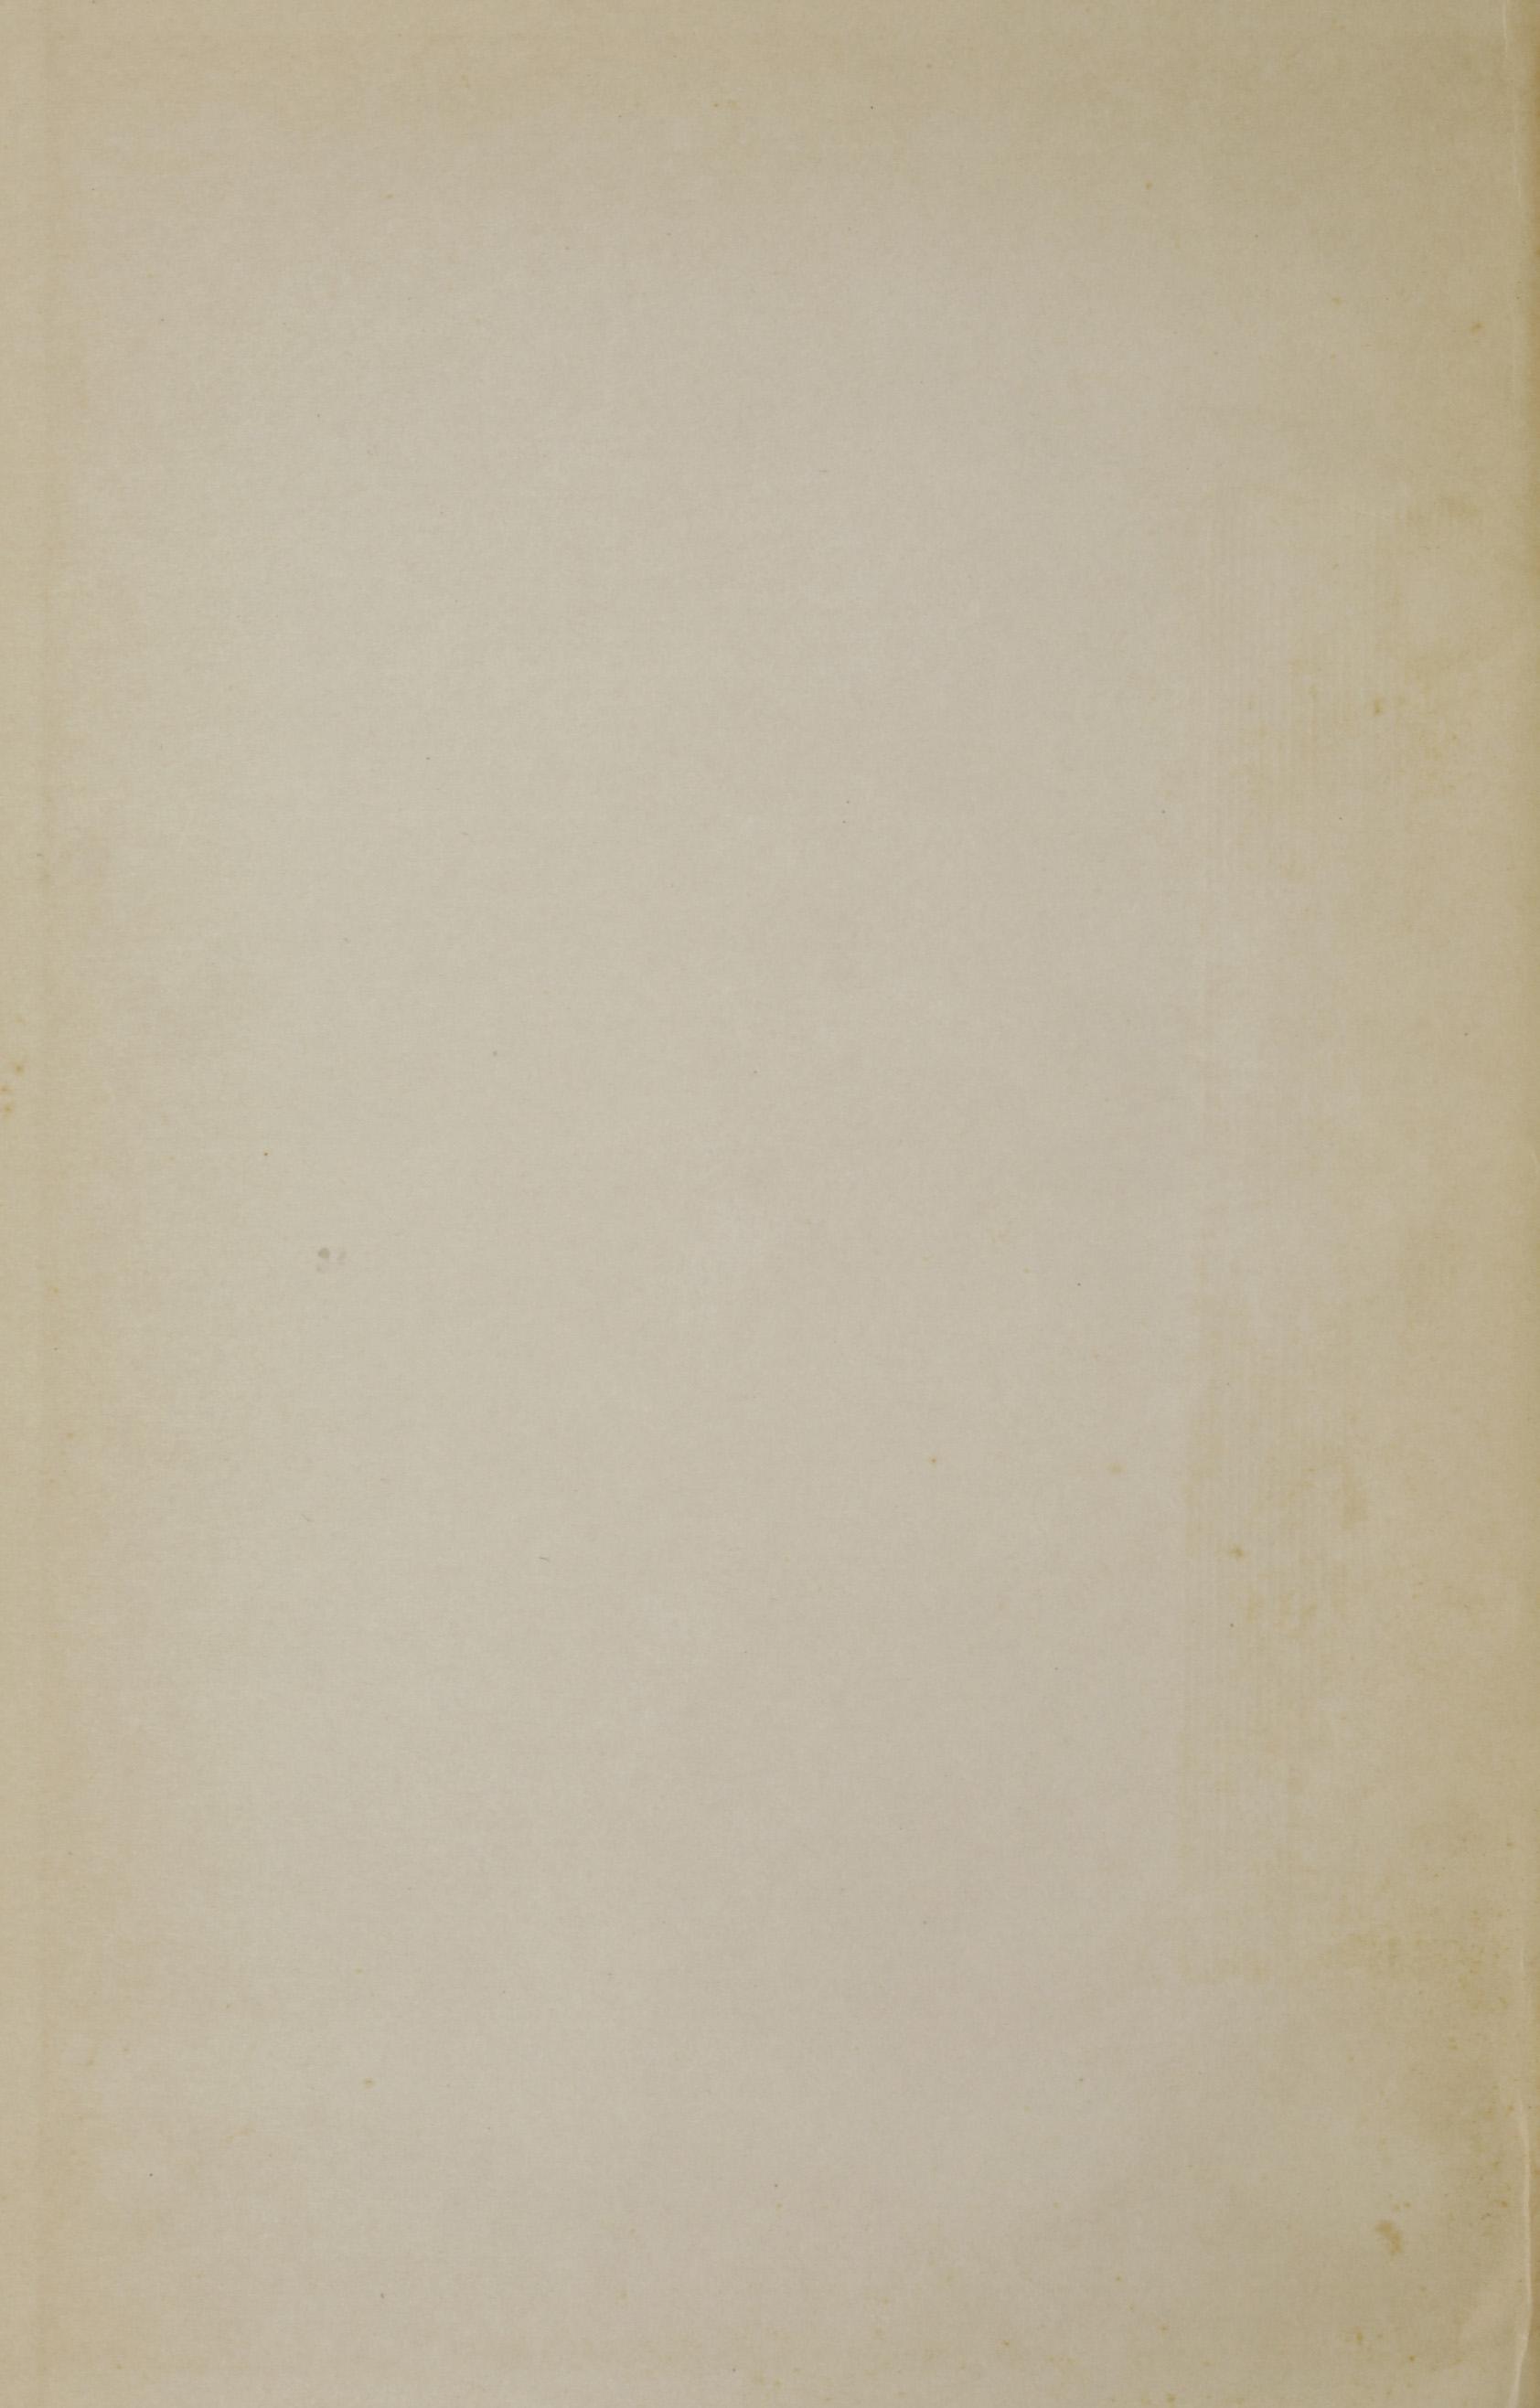 Charleston Yearbook, 1930, inside cover